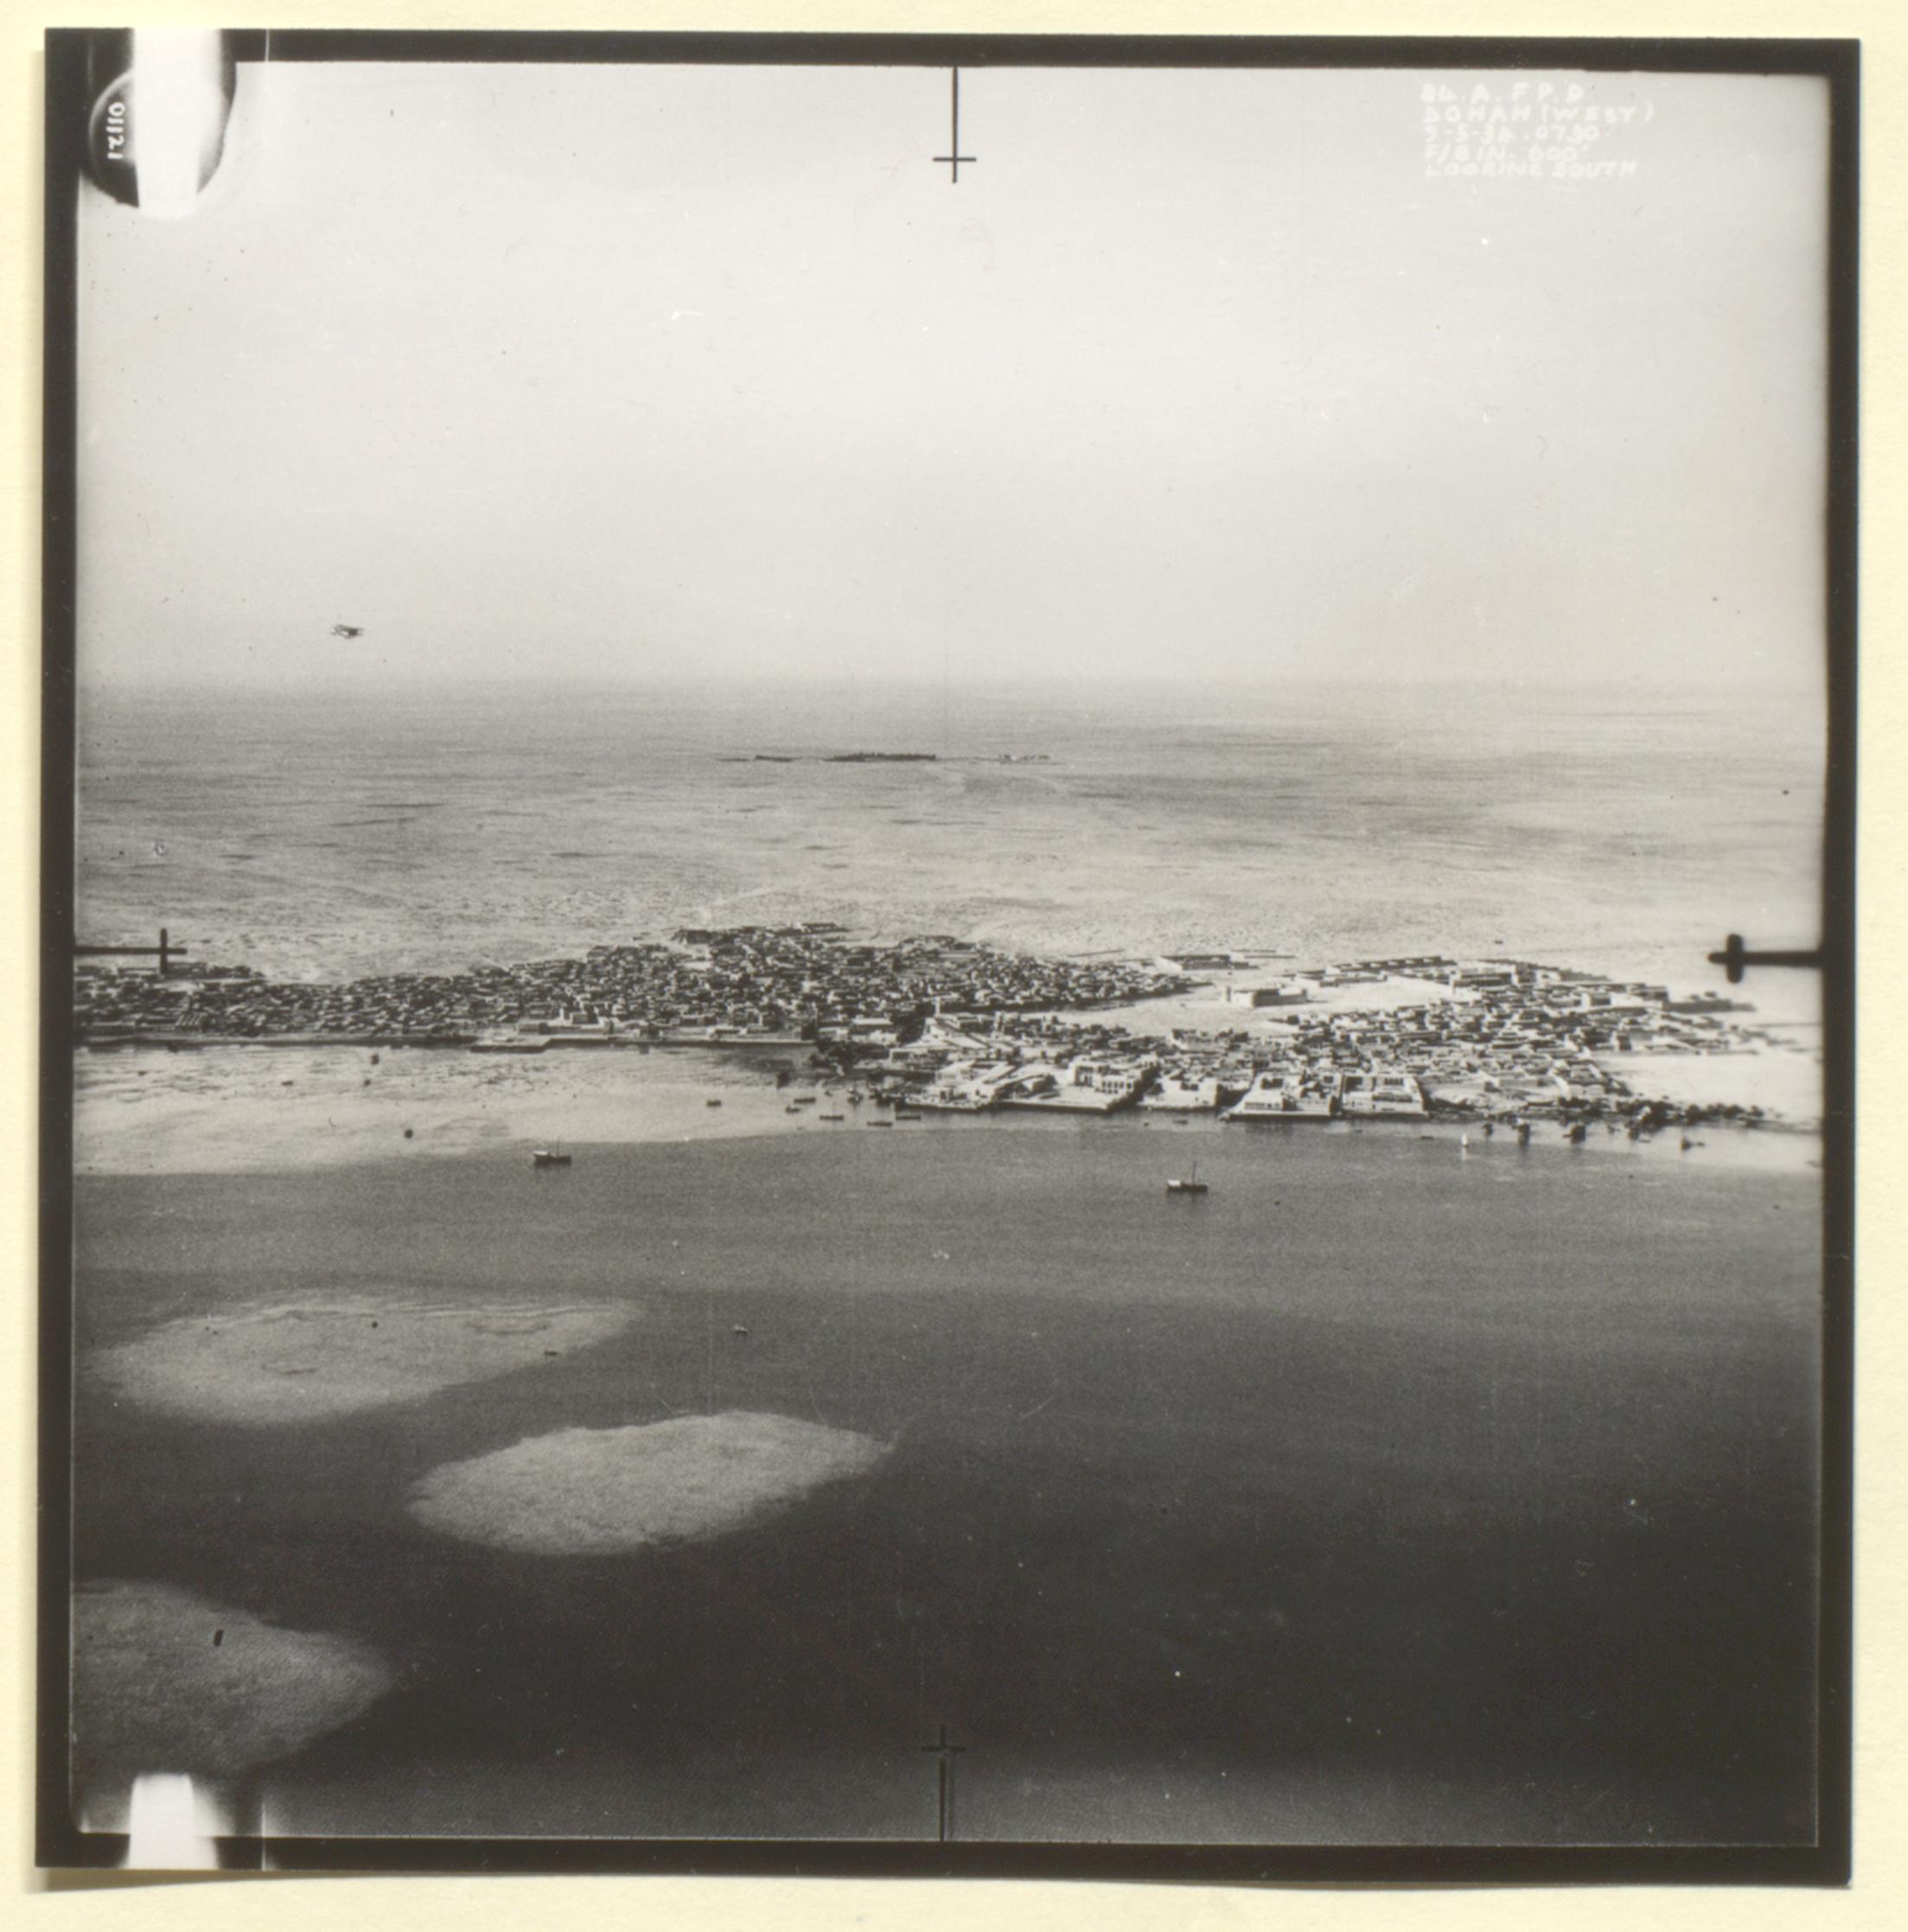 5th Royal Air Force photograph of Doha, Kara-Ana and Raiyan from a the file 'Air-route to India: Arab coast route; emergency landing ground at Qatar' (1934) (IOR/L/PS/12/1956)